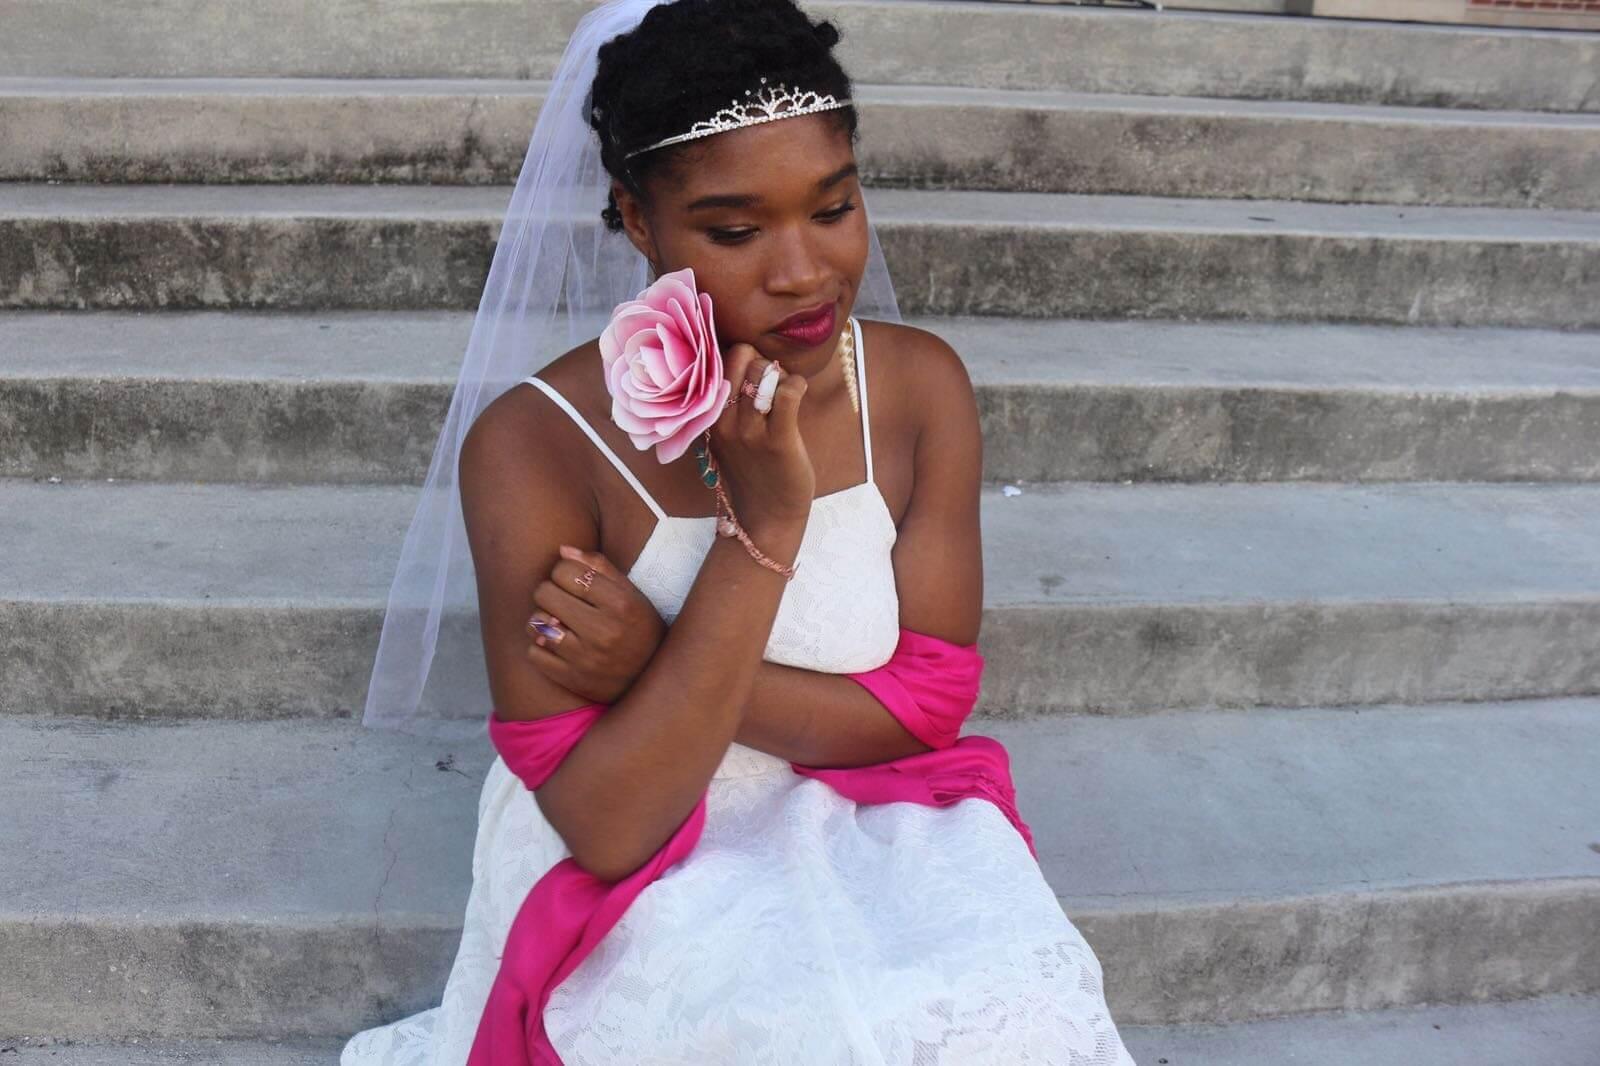 Kimaya Wedding Dress on Stairs